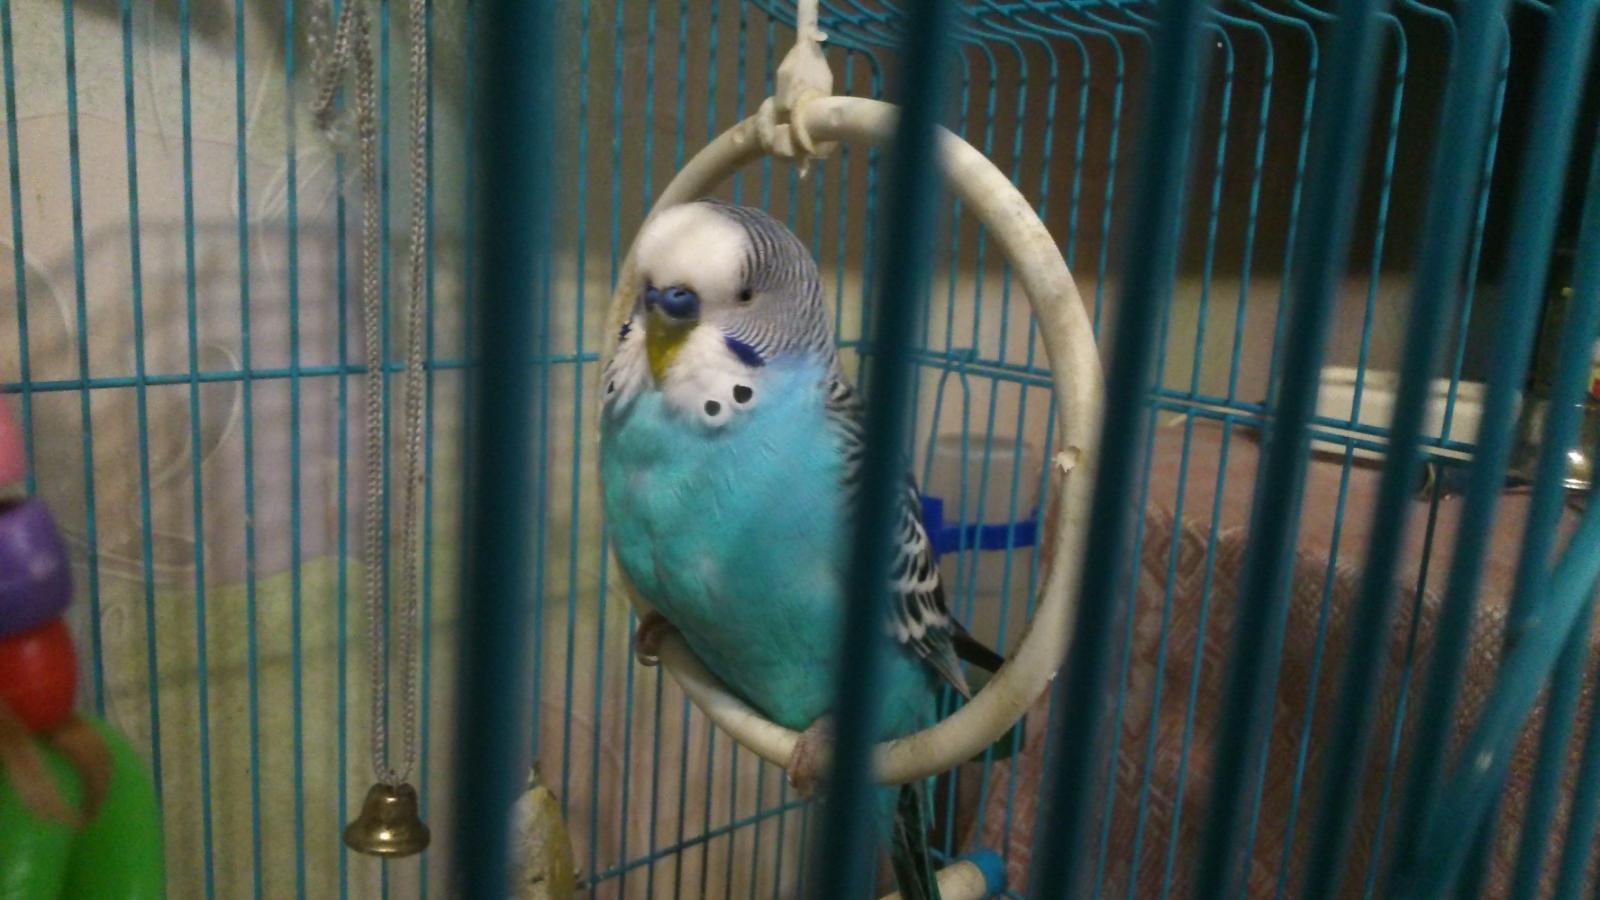 четкая фото птицы - DSC_0281.JPG